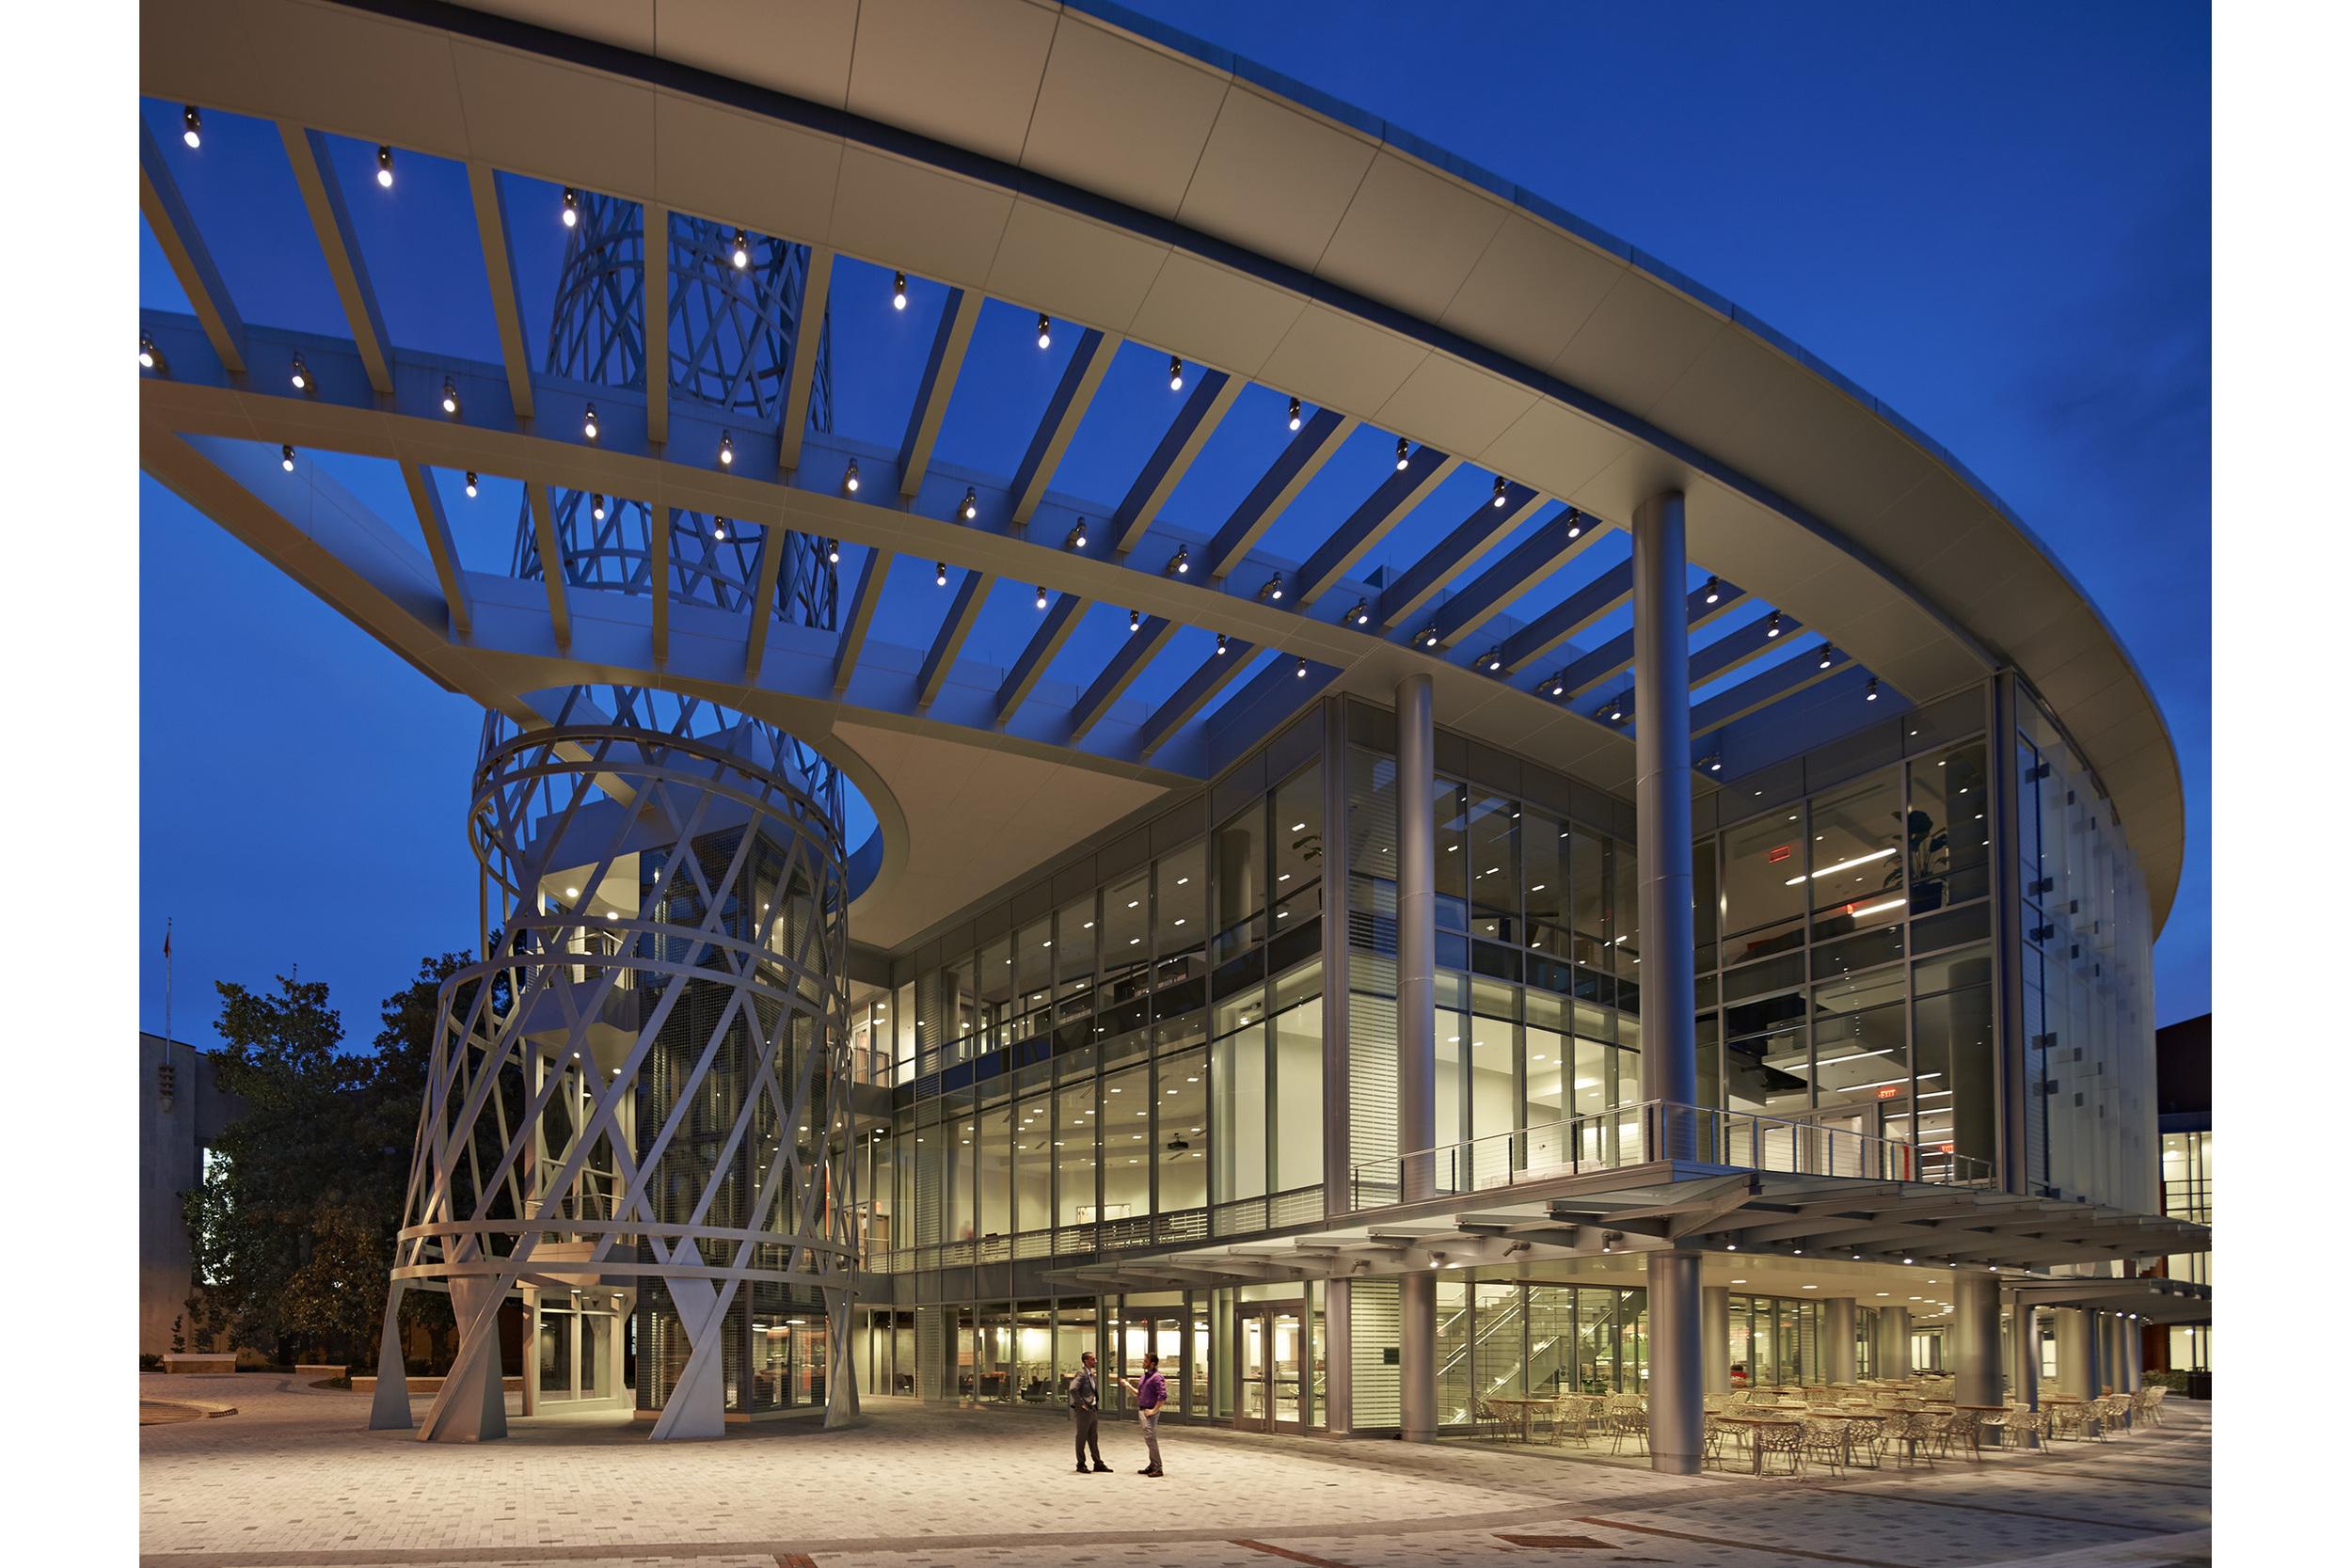 Robert Benson Photography. Duda Paine Architects, North Carolina State University, Talley Student Union. Academic buildings. Professional, award-winning, architectural photography.